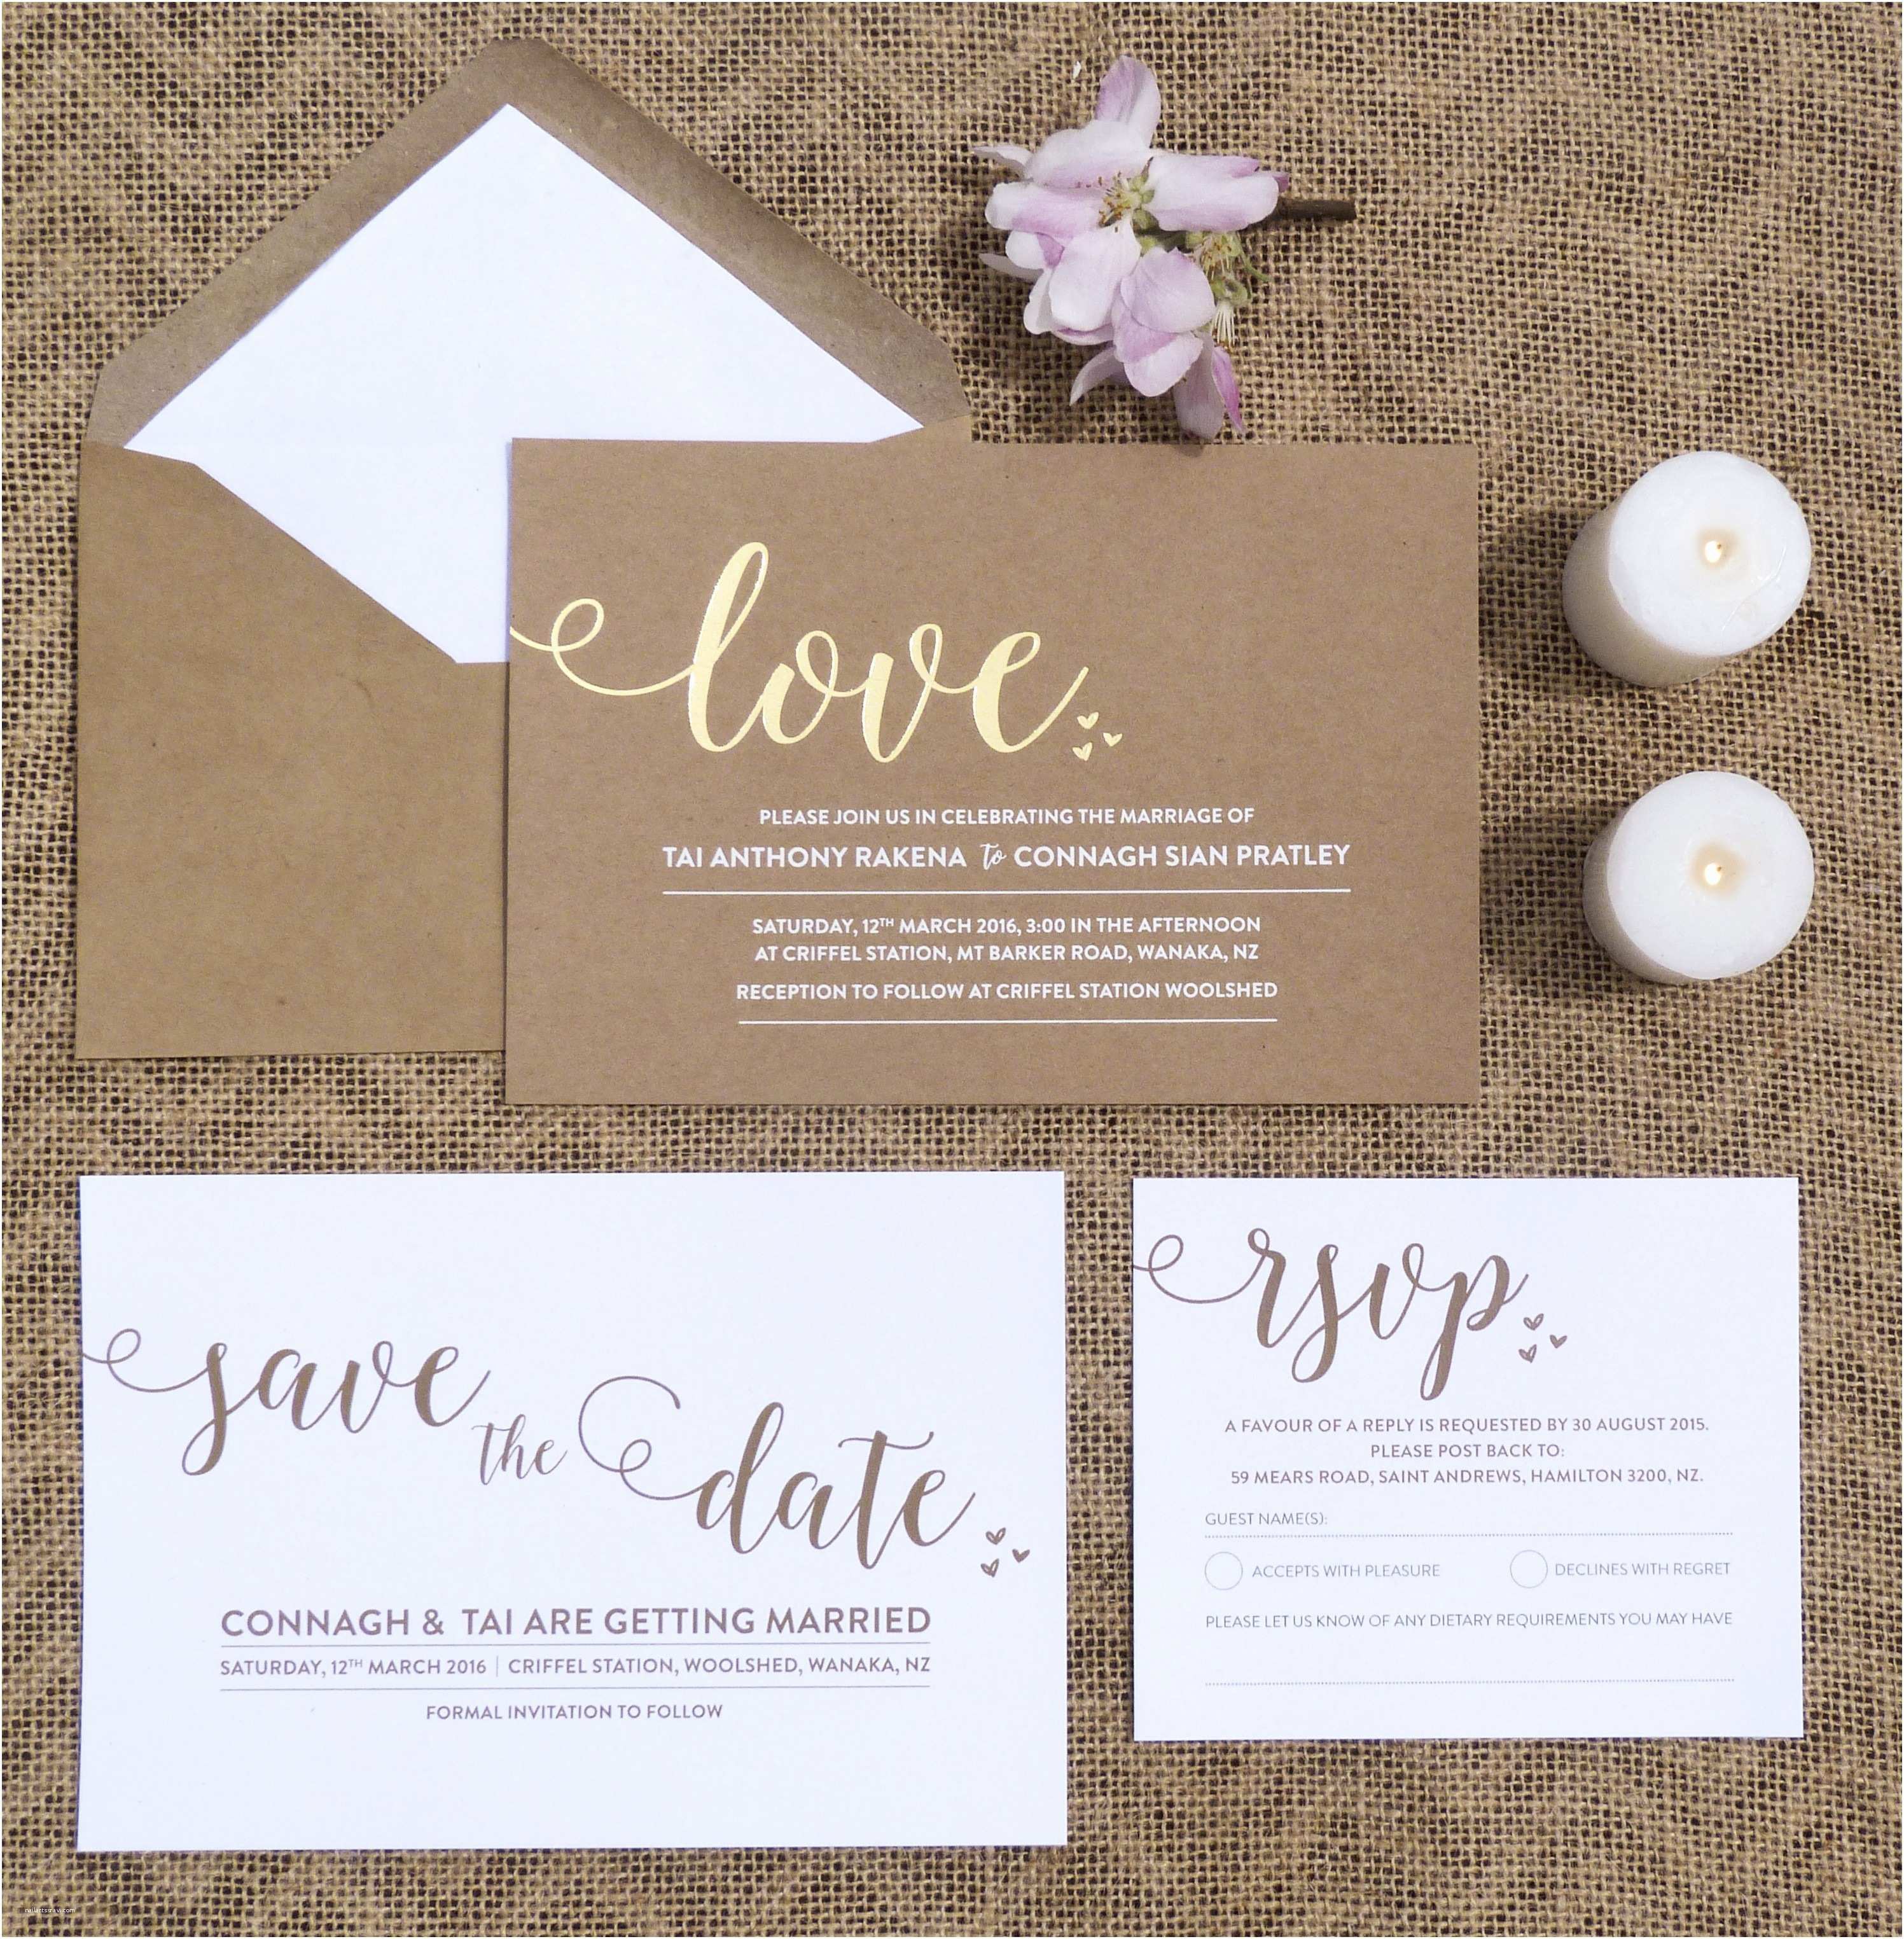 Best Wedding Invitations Ever Wedding Invitation Design Nz Valid Black and Gold Wedding